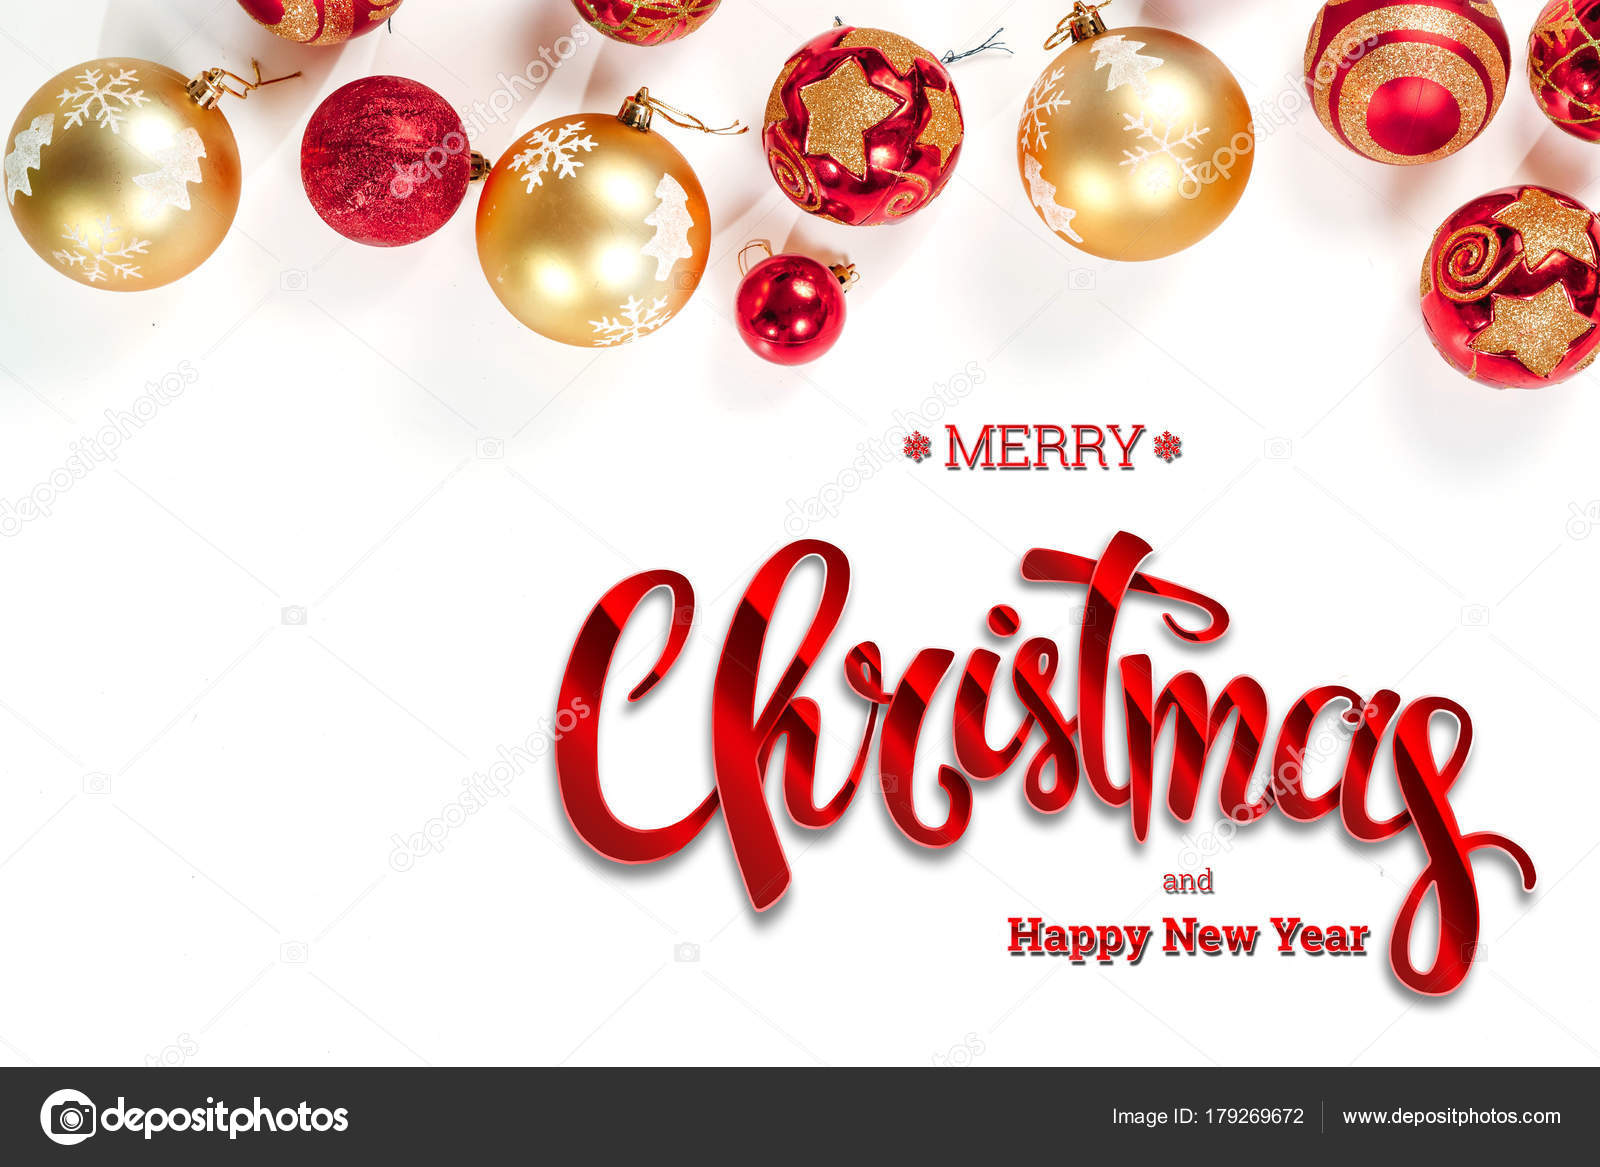 inscription merry christmas happy new year toys white background christmas stock photo c markoaliaksandr 179269672 https depositphotos com 179269672 stock photo inscription merry christmas happy new html